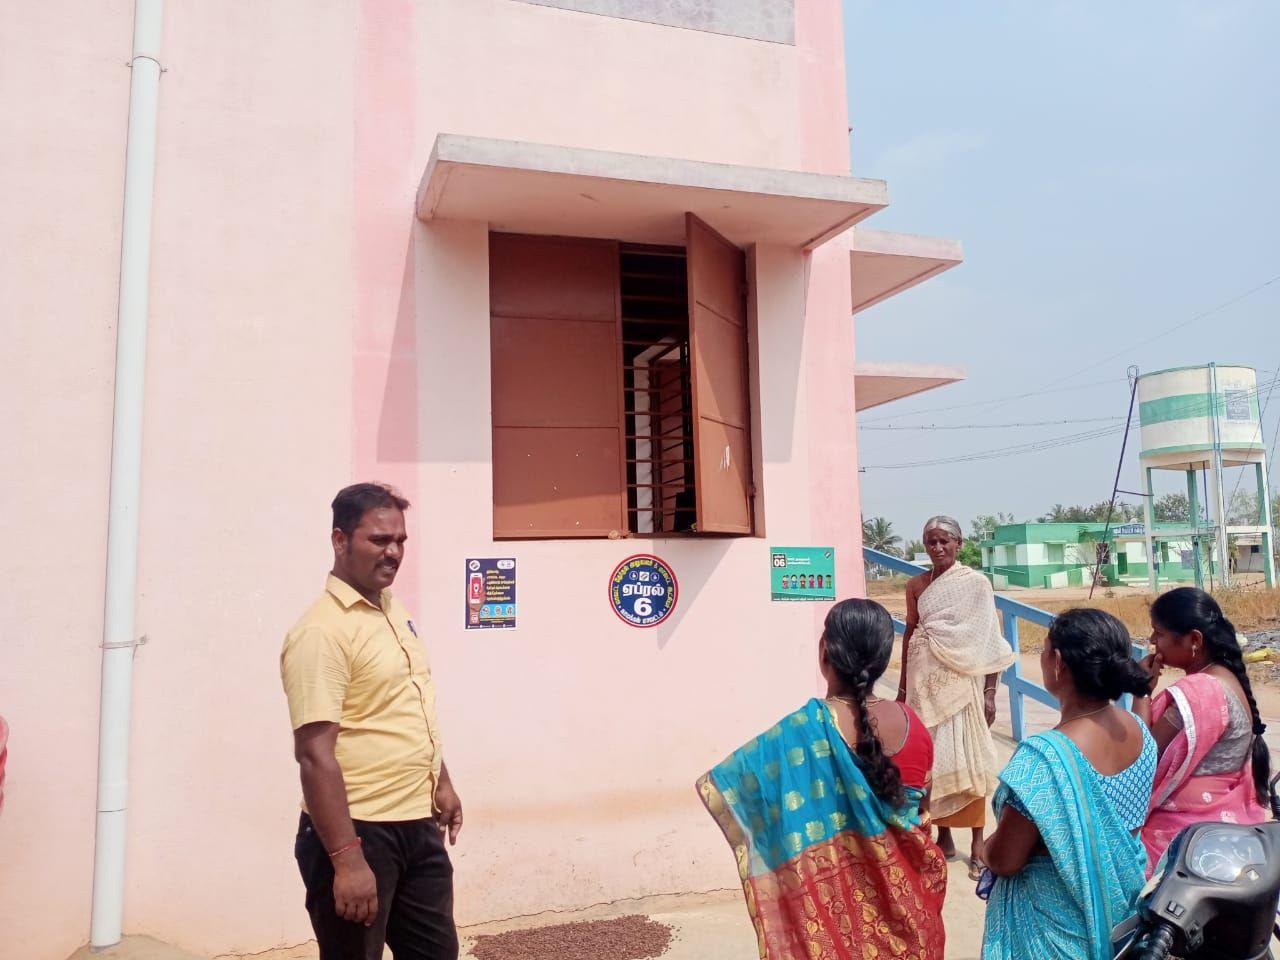 TNLA2021 - 96 Tiruchengode - Voters Awareness Programme - Noctice issued - Tiruchengode Block - On 01.04.2021 (1).jpeg